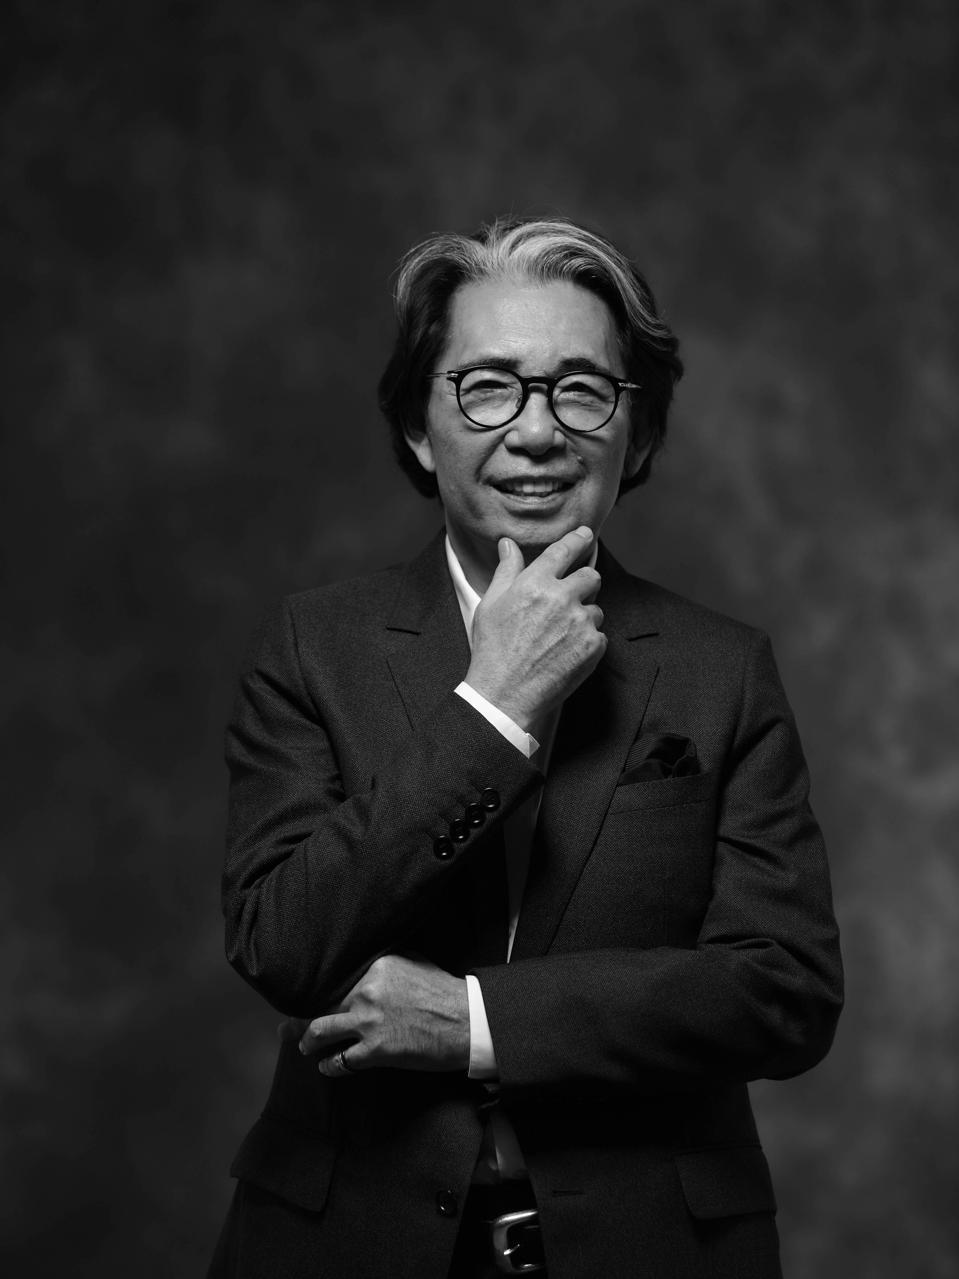 Fashion designer Kenzo Takada has died in Paris, aged 81.